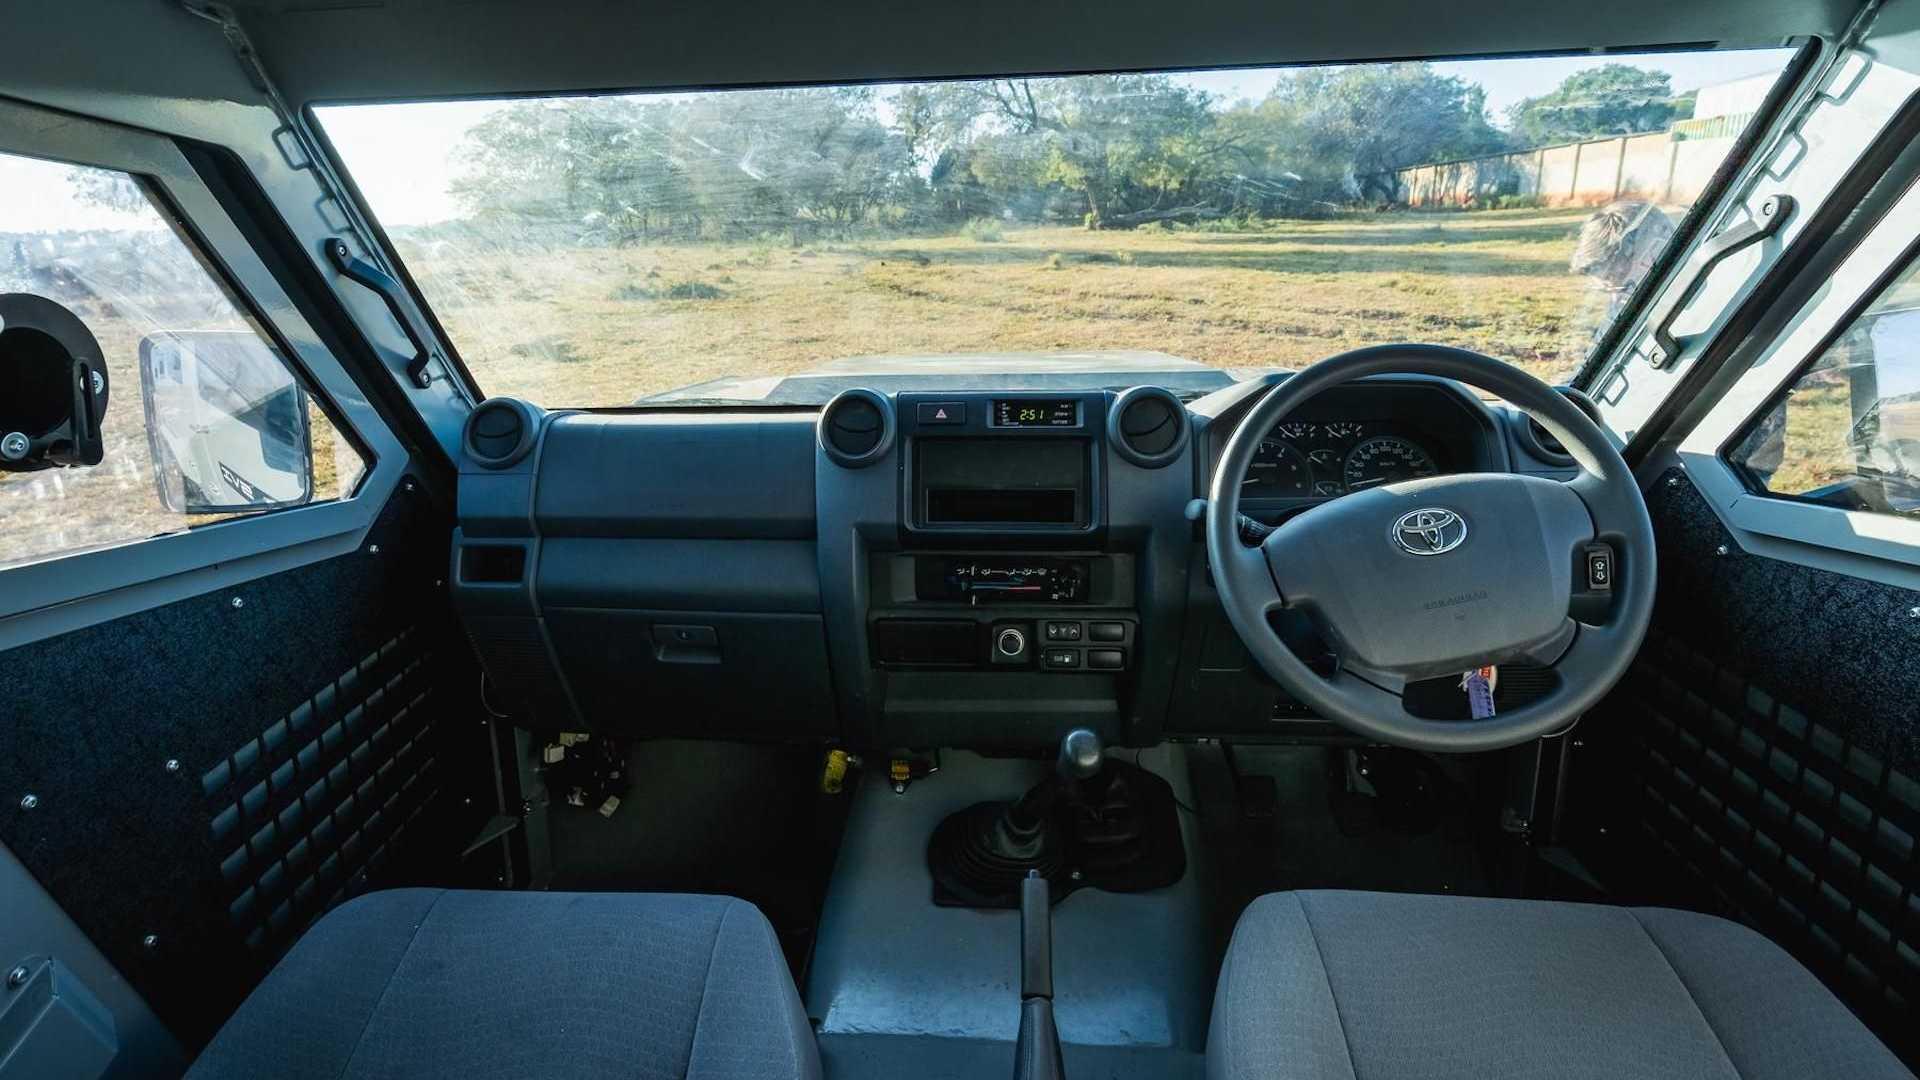 SVI-Max-3-Troopy-Toyota-Land-Cruiser-79-7